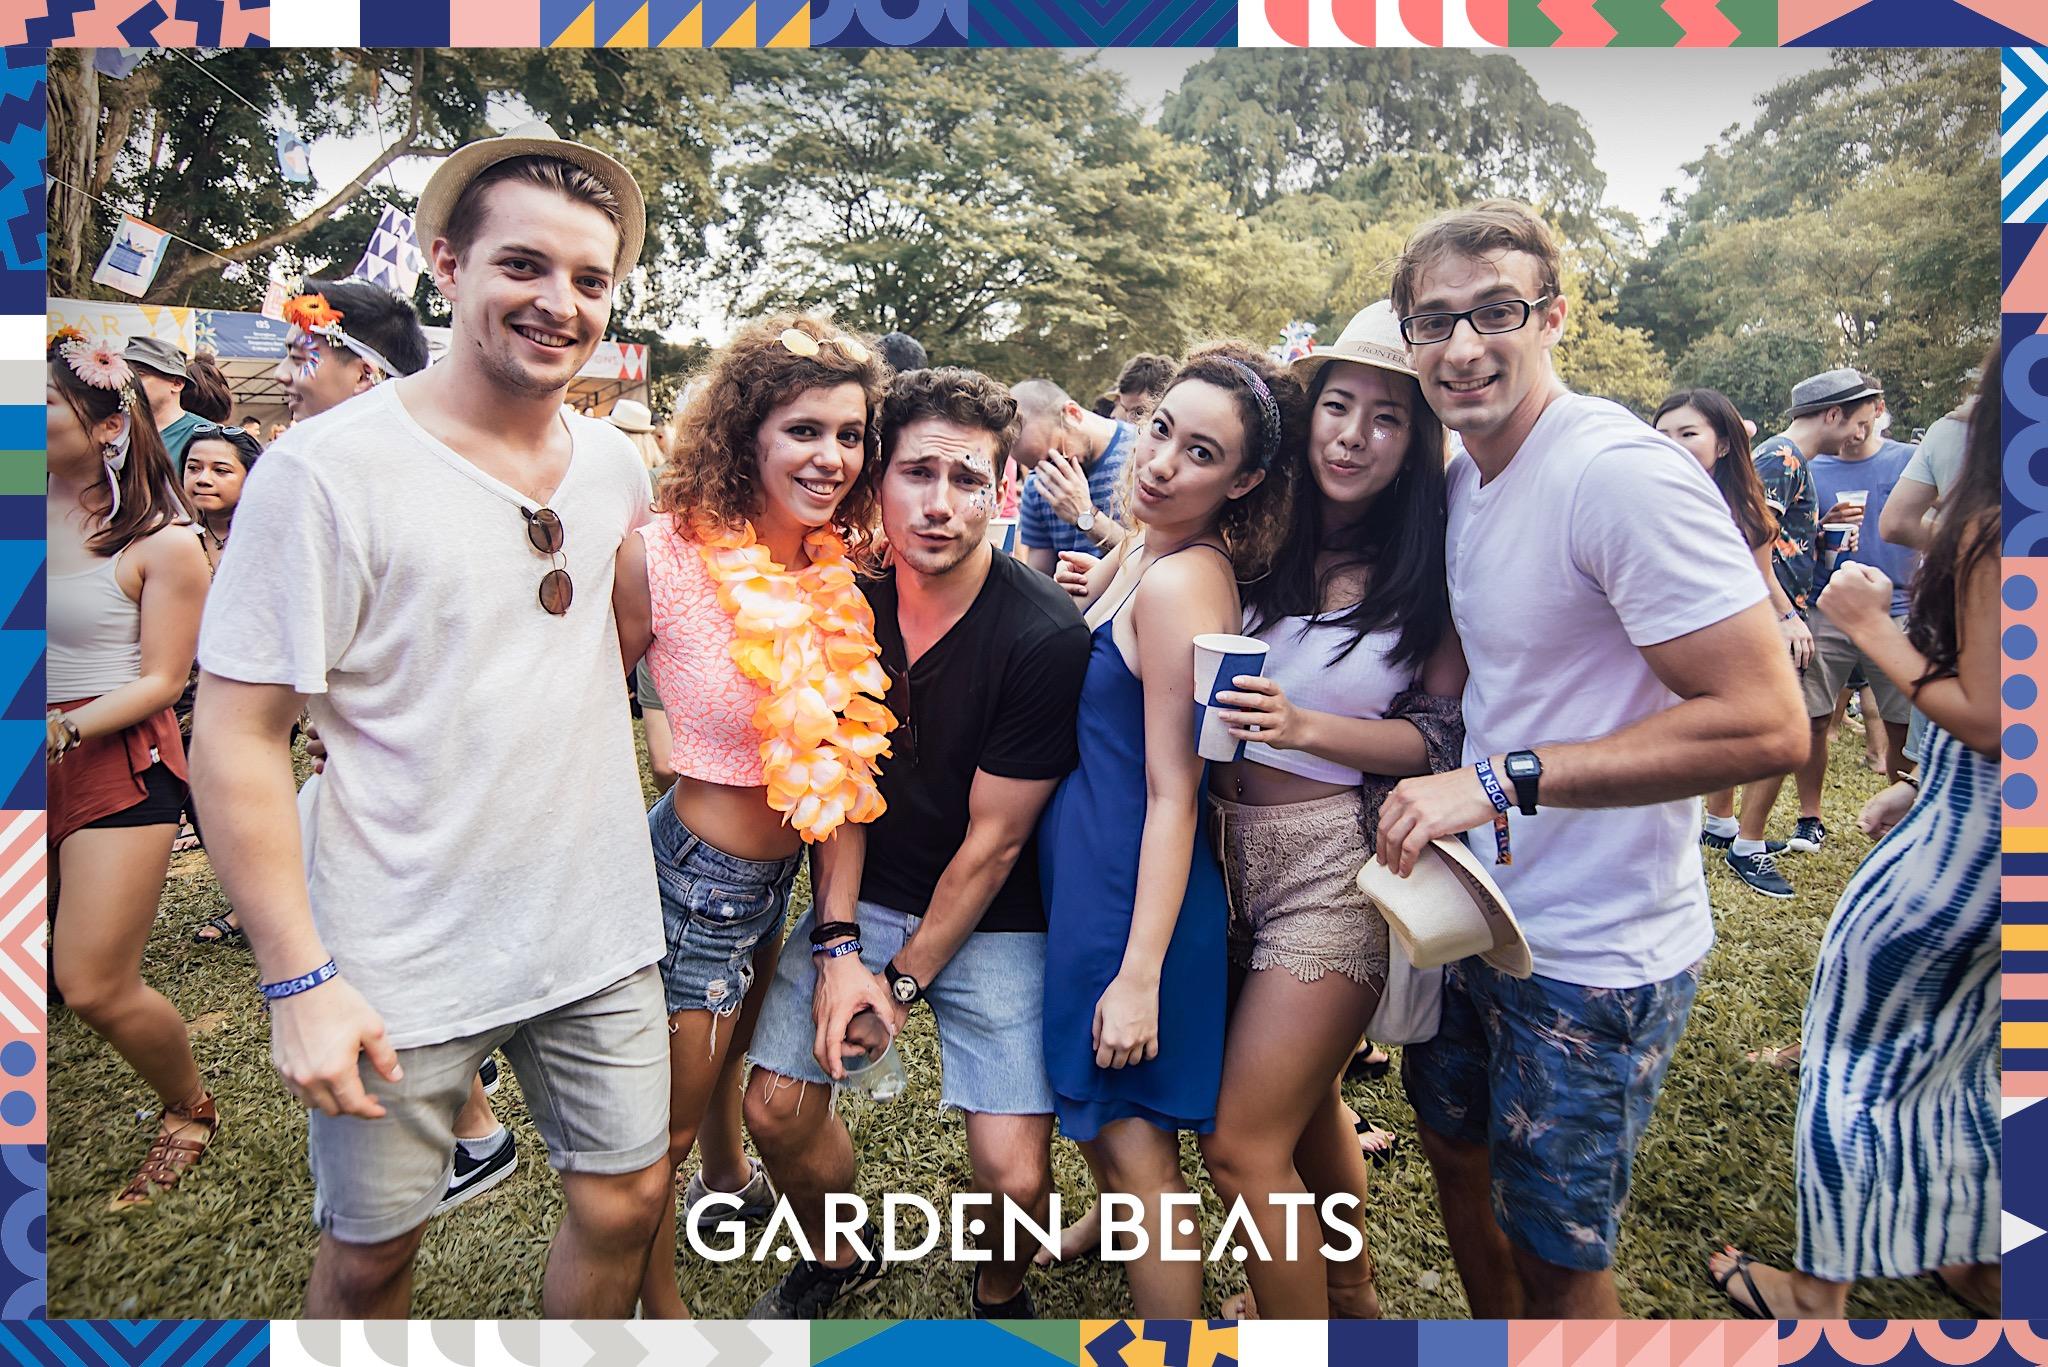 18032017_GardenBeats_Colossal586_WatermarkedGB.jpg